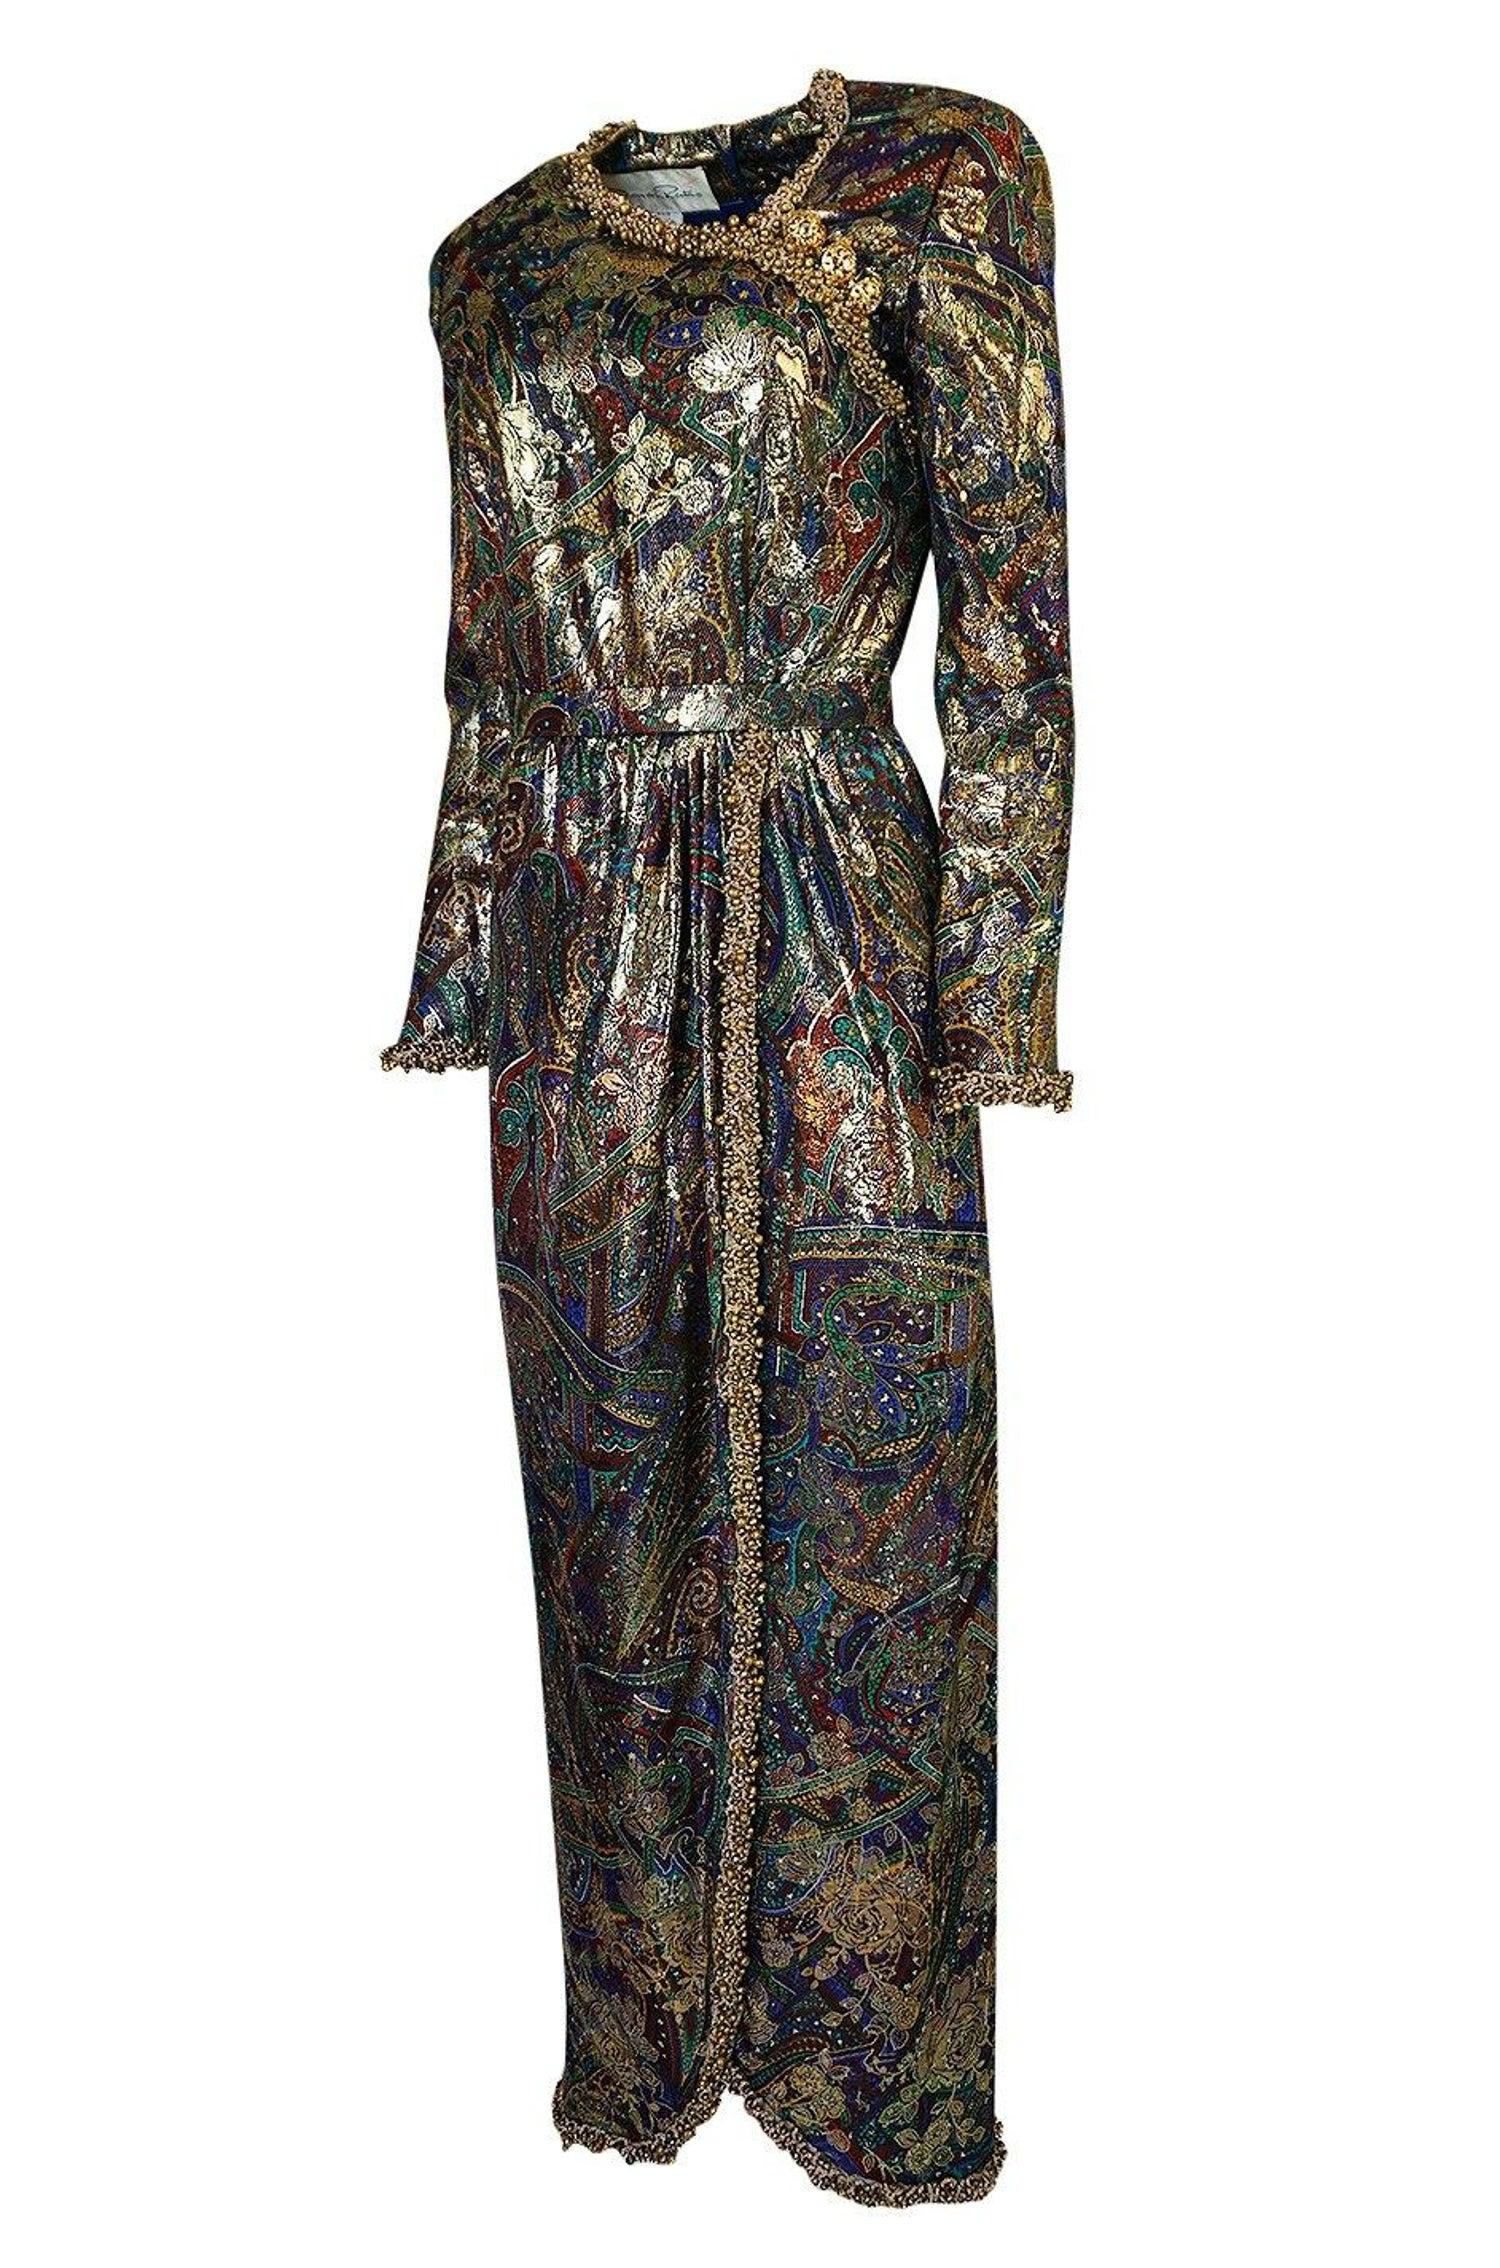 1975 Oscar de la Renta Printed Metallic Silk Dress w Brass Bell Edging